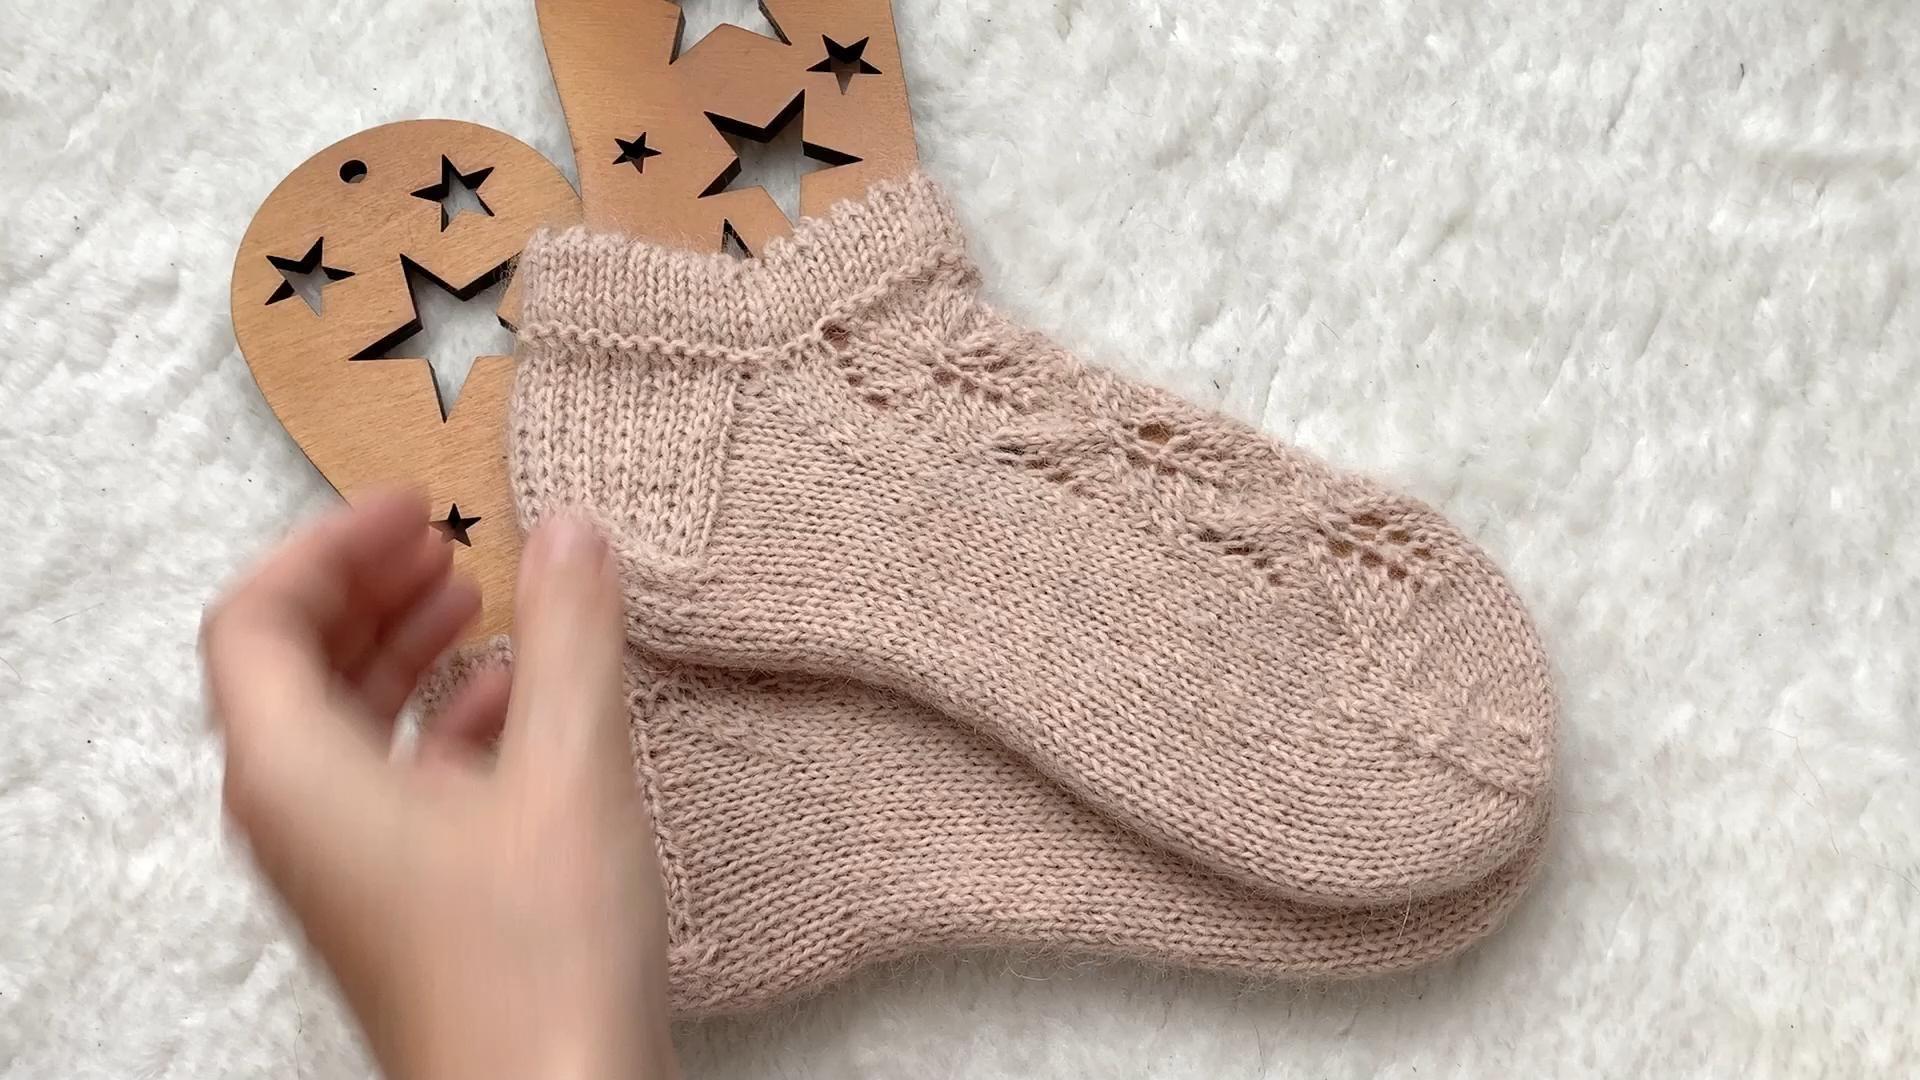 Lace socks knitting pattern, PDF Instant Download, Woman slippers socks Beginner knitting Fuzzy socks